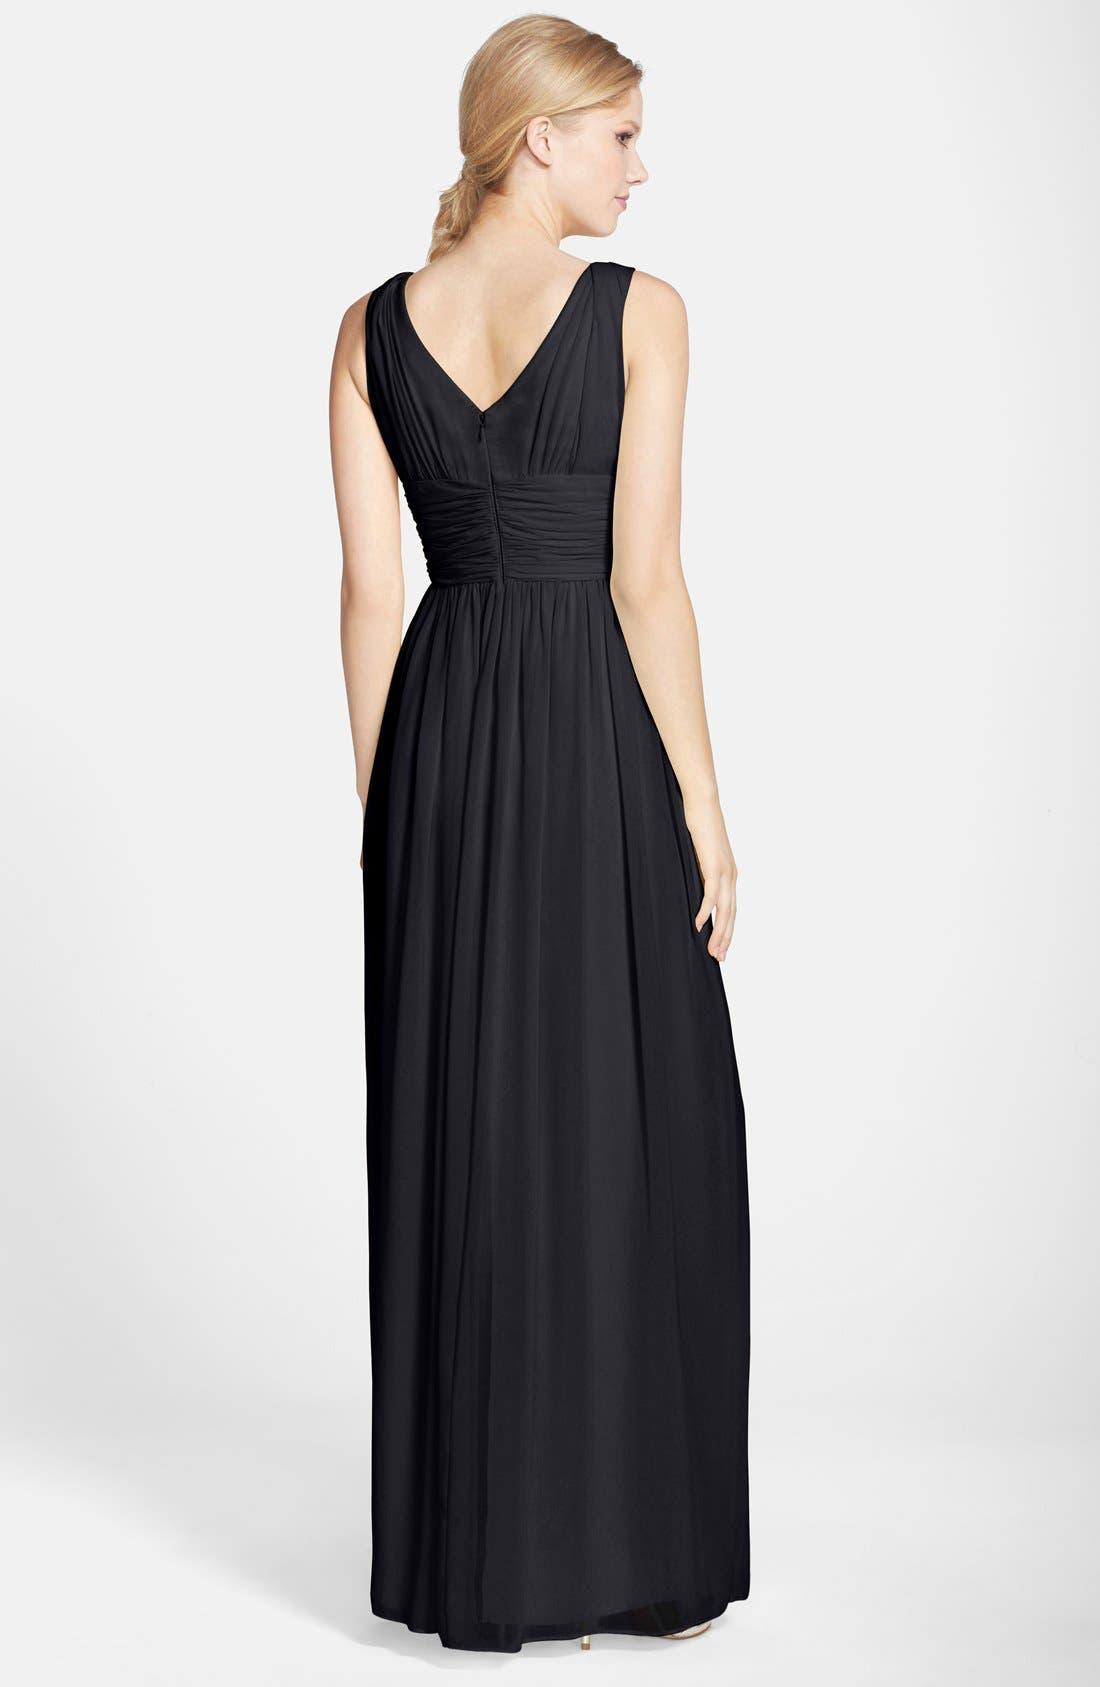 DONNA MORGAN,                             'Julie' Twist-Waist Silk Chiffon Gown,                             Alternate thumbnail 3, color,                             001